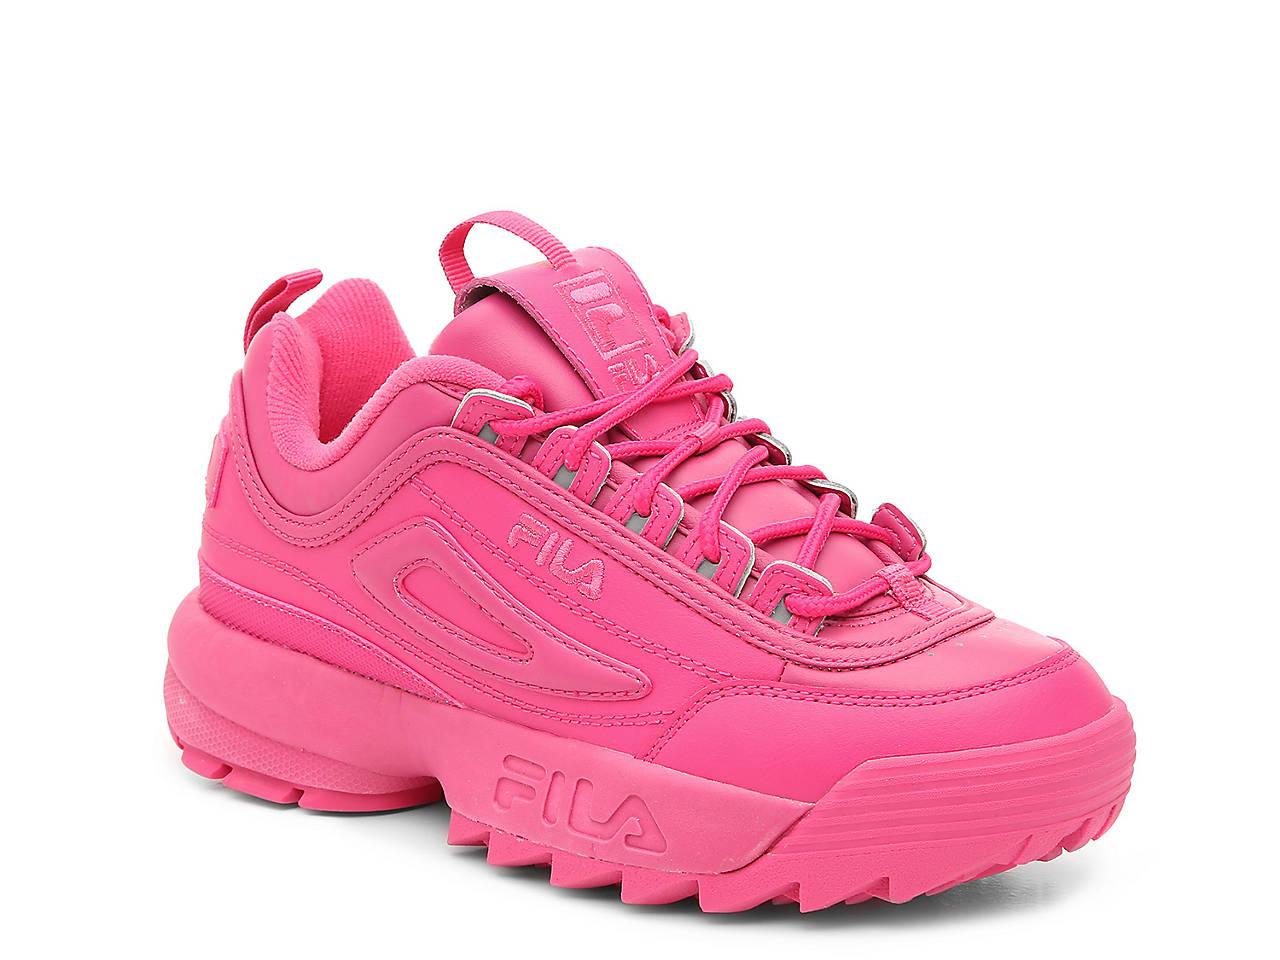 e6ce98662898 Fila Disruptor II Premium Sneaker - Women s Men s Shoes